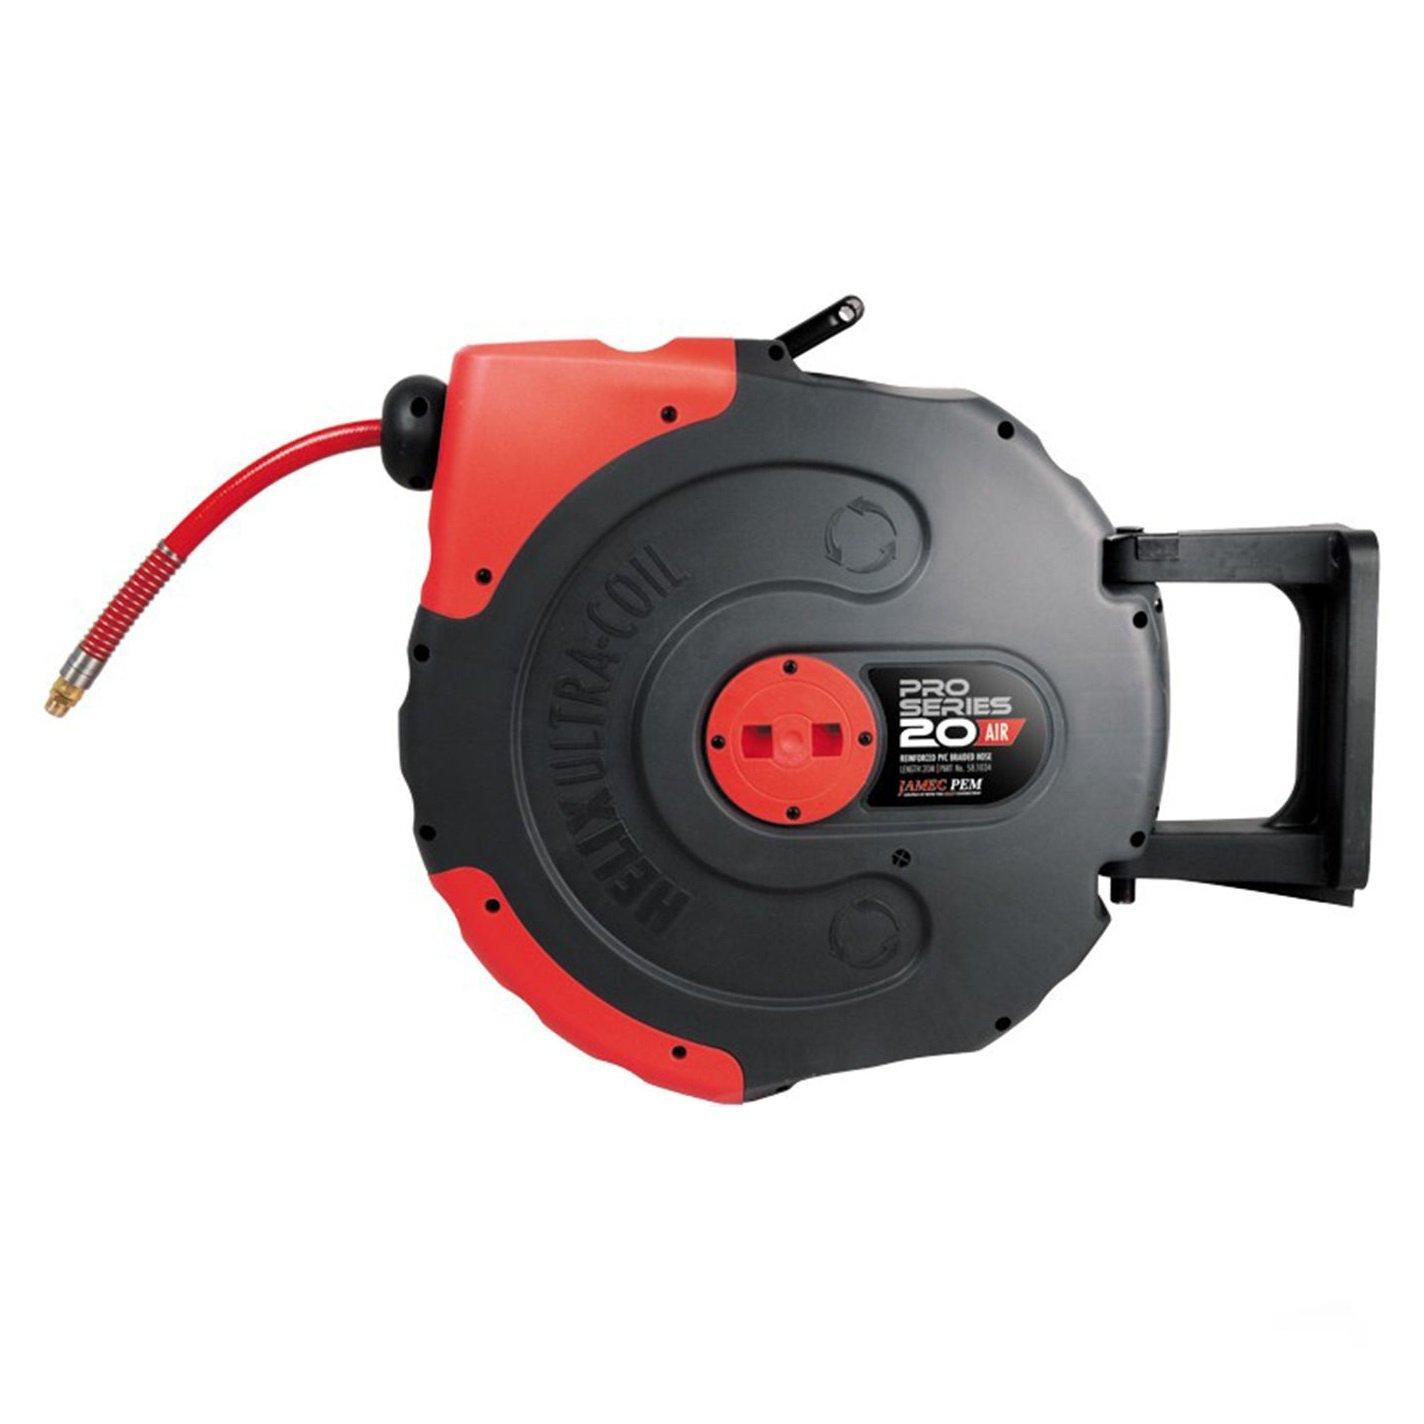 Jamec Pem Pro Series HELIX Retractable Air Hose Reel 300psi 20m 58.1034